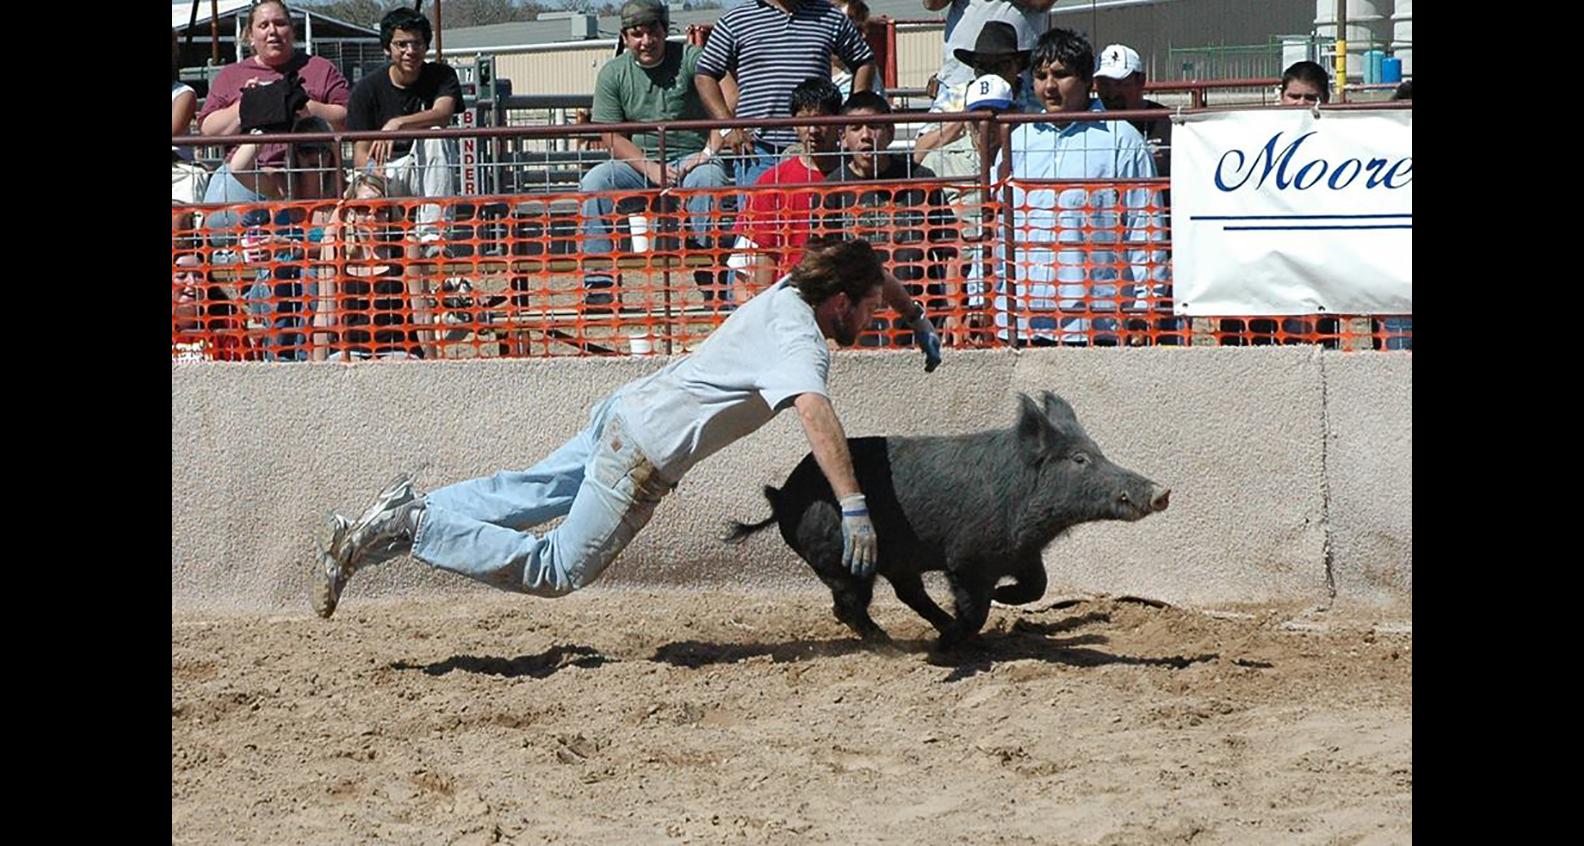 Hog racing